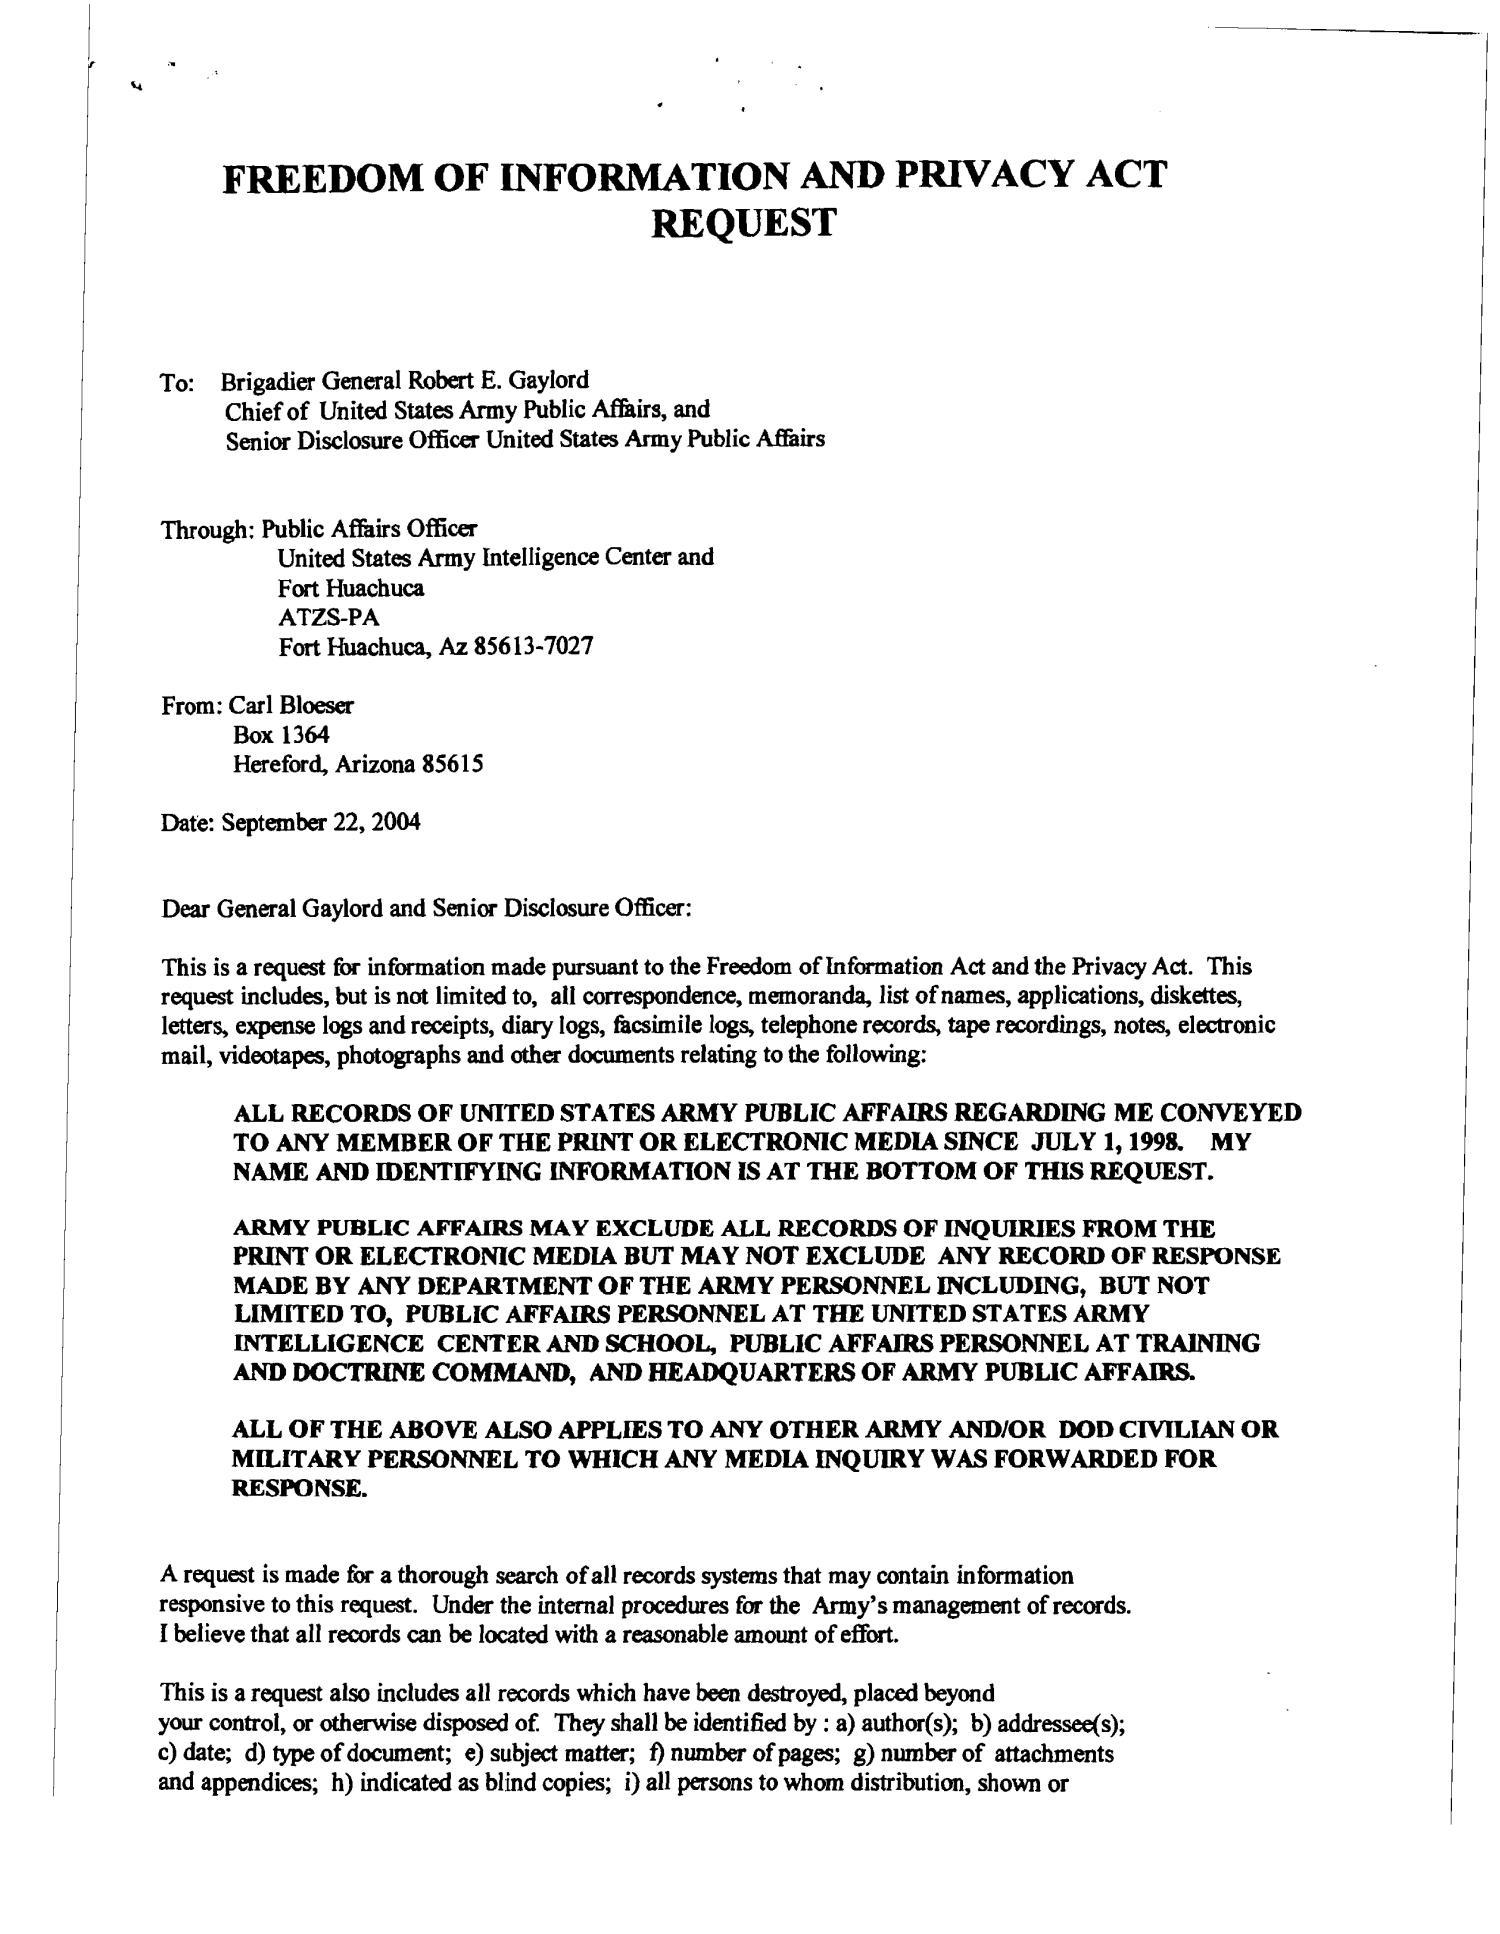 munity Correspondence Letter from Carl Bloeser Ft Huachuca